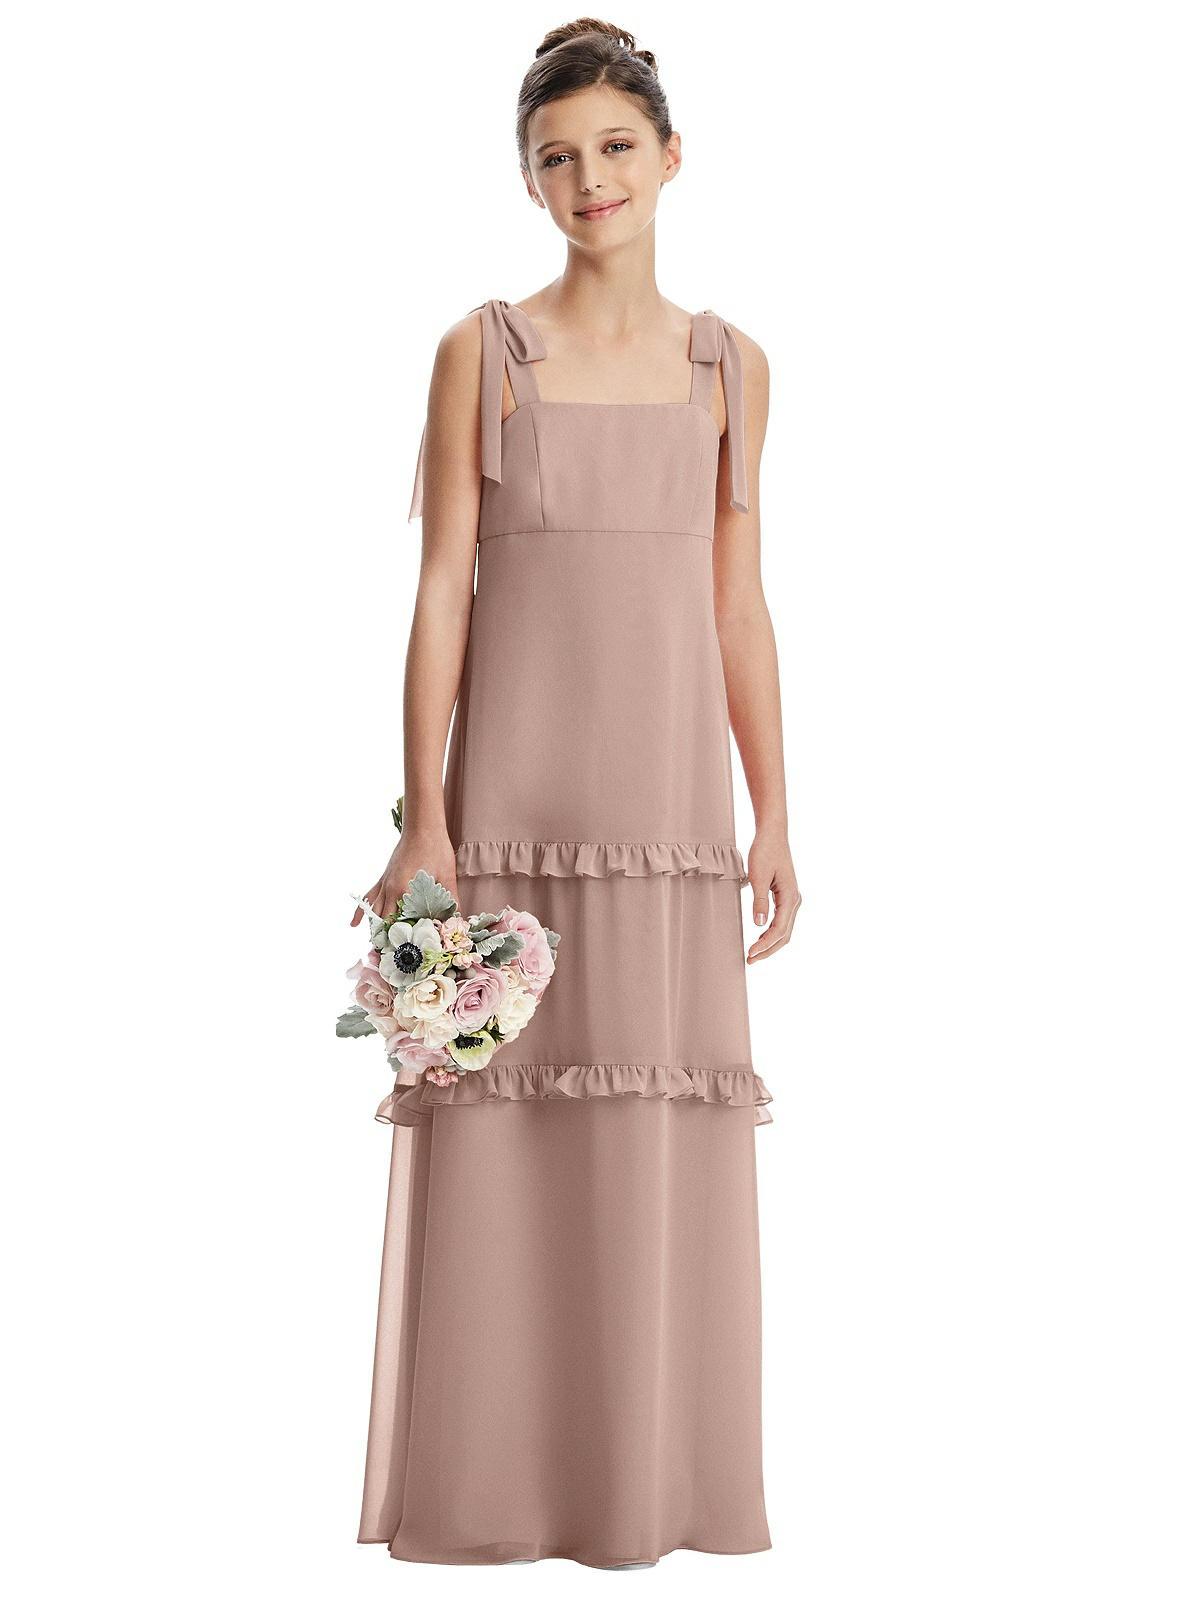 Bliss Pink Bow Strap Tiered Ruffles Junior Bridesmaids Dress